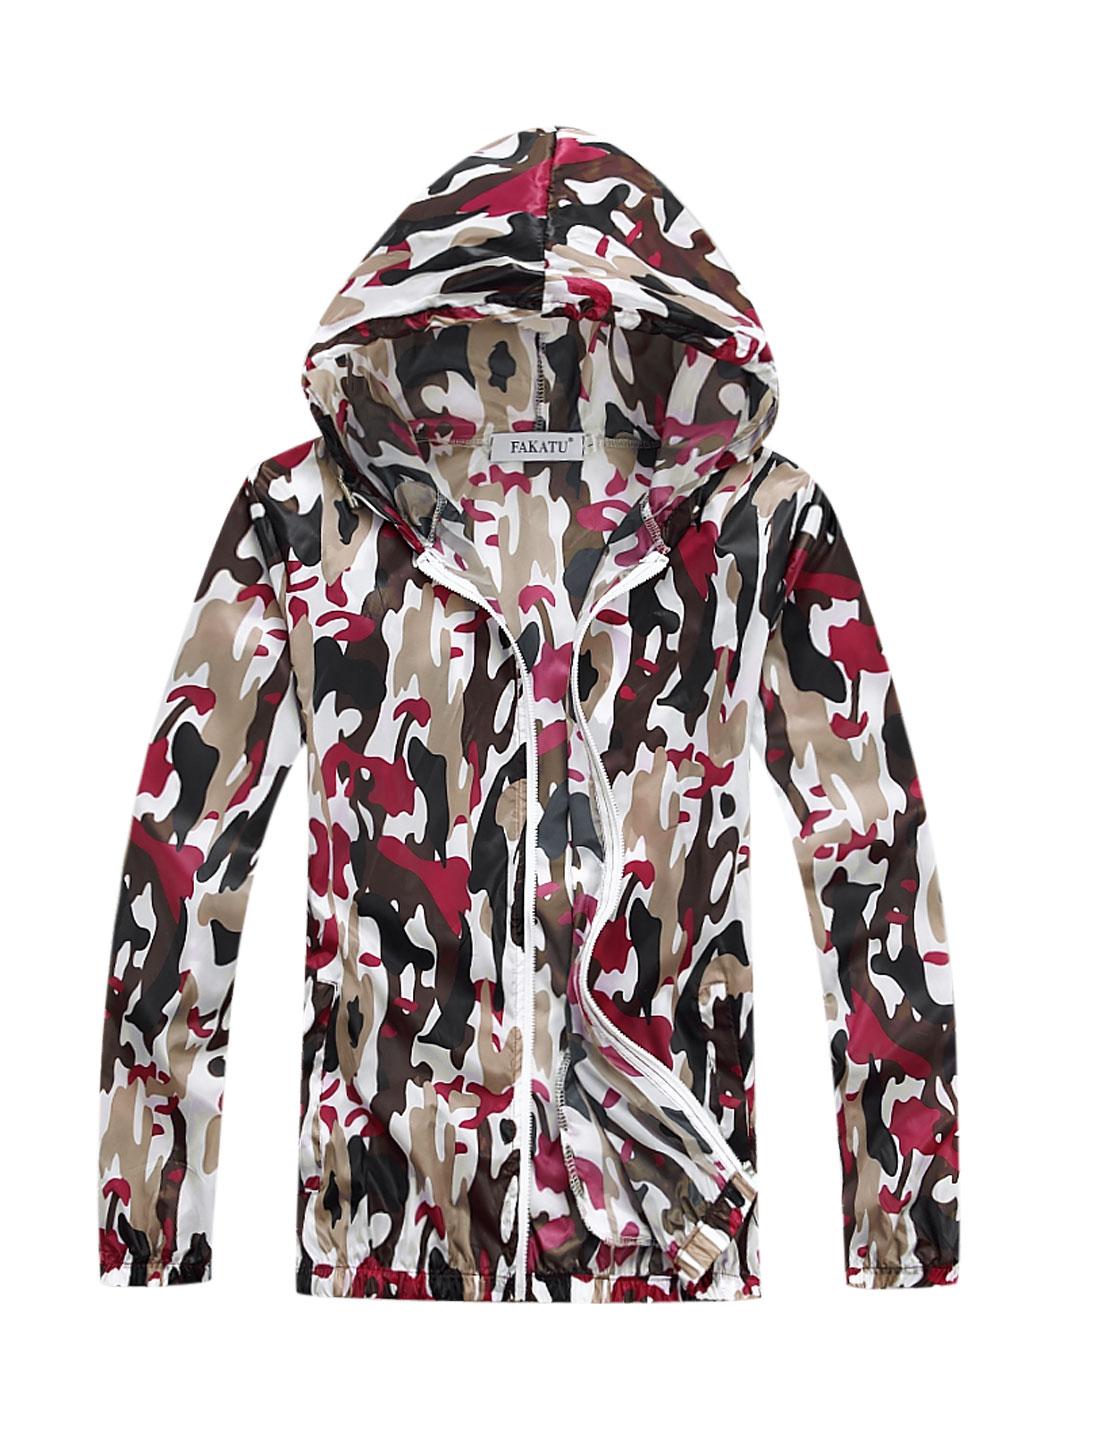 Men Drawstring Zipper Closure Camouflage Prints Thin Jacket Fuchsia M